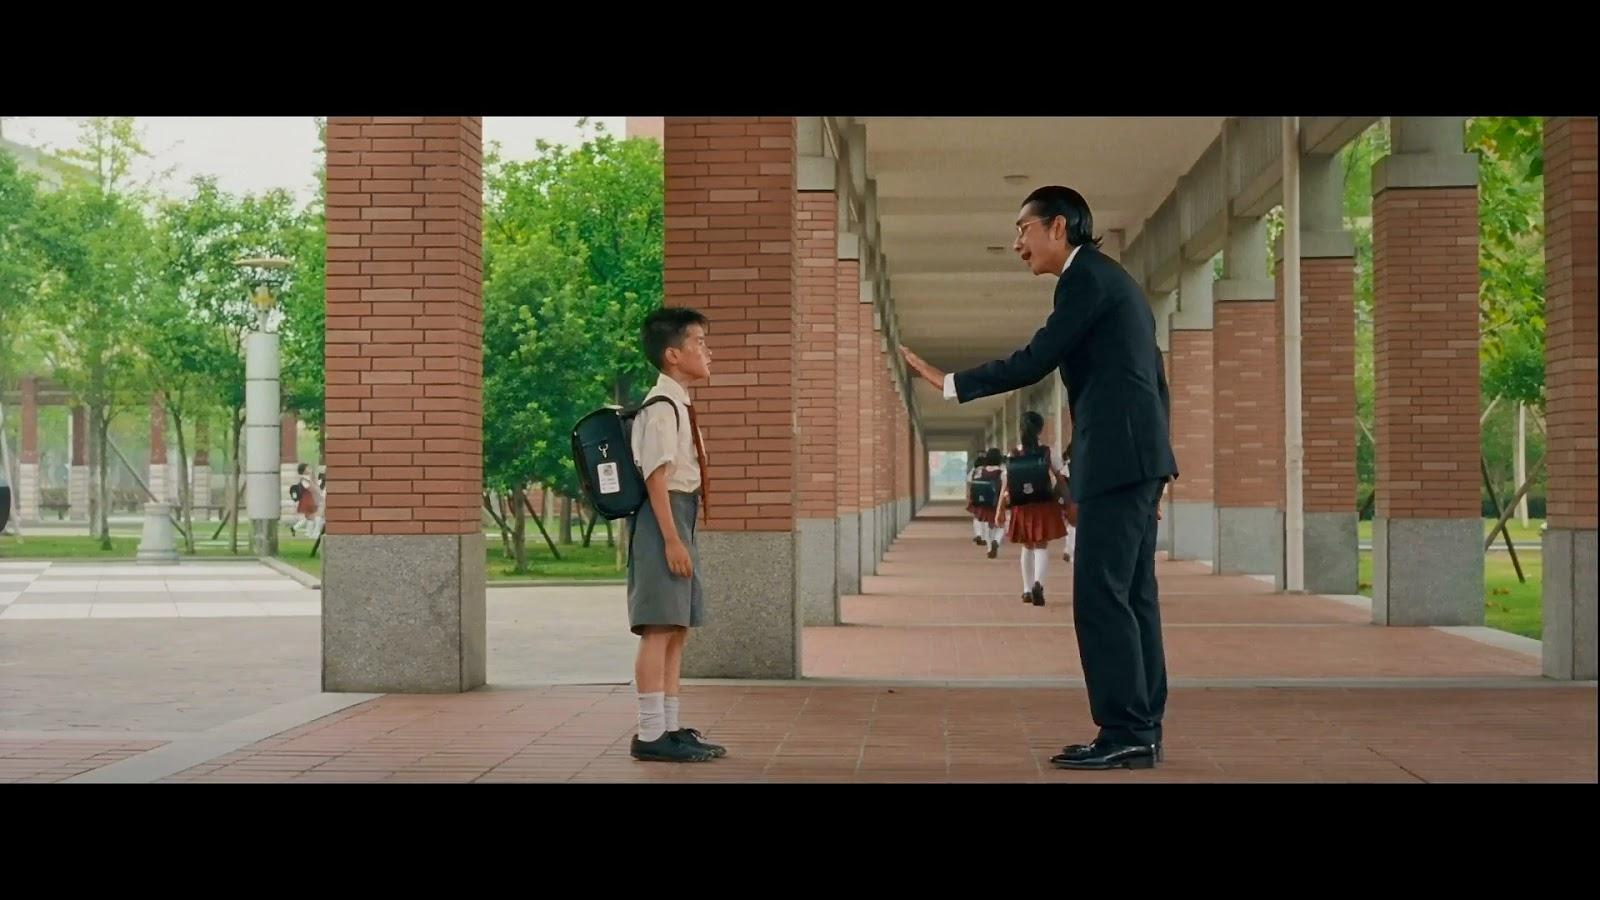 CJ7 |Juguete del Espacio |2008 |1080p.|Trial |Latino